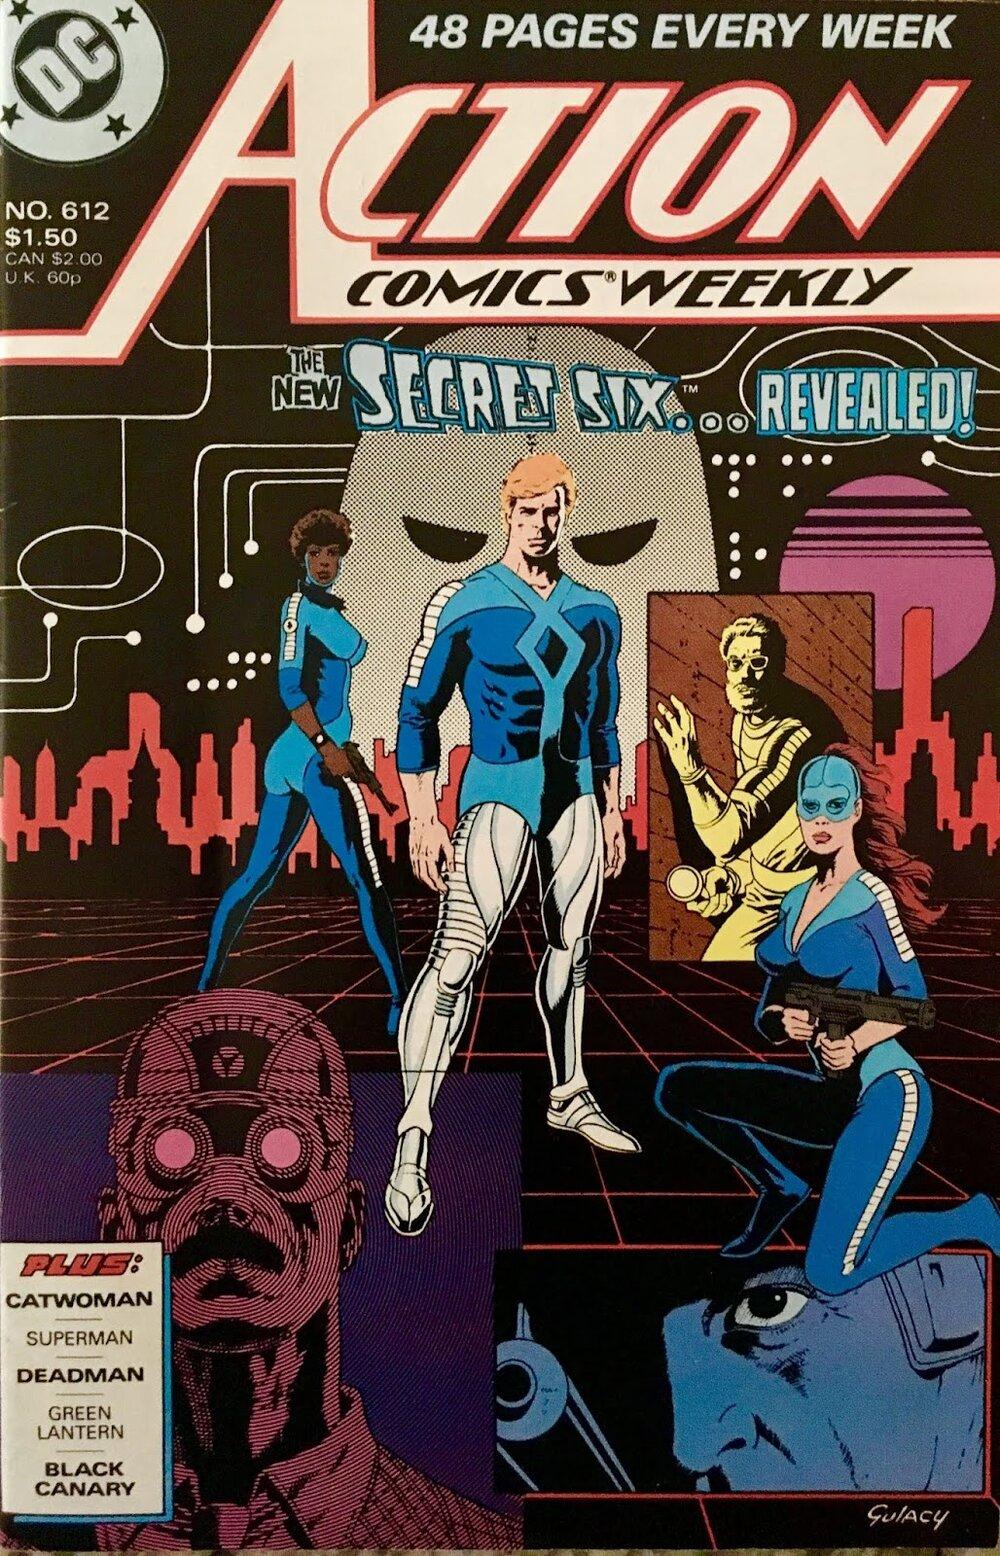 Action Comics Weekly 612.jpg